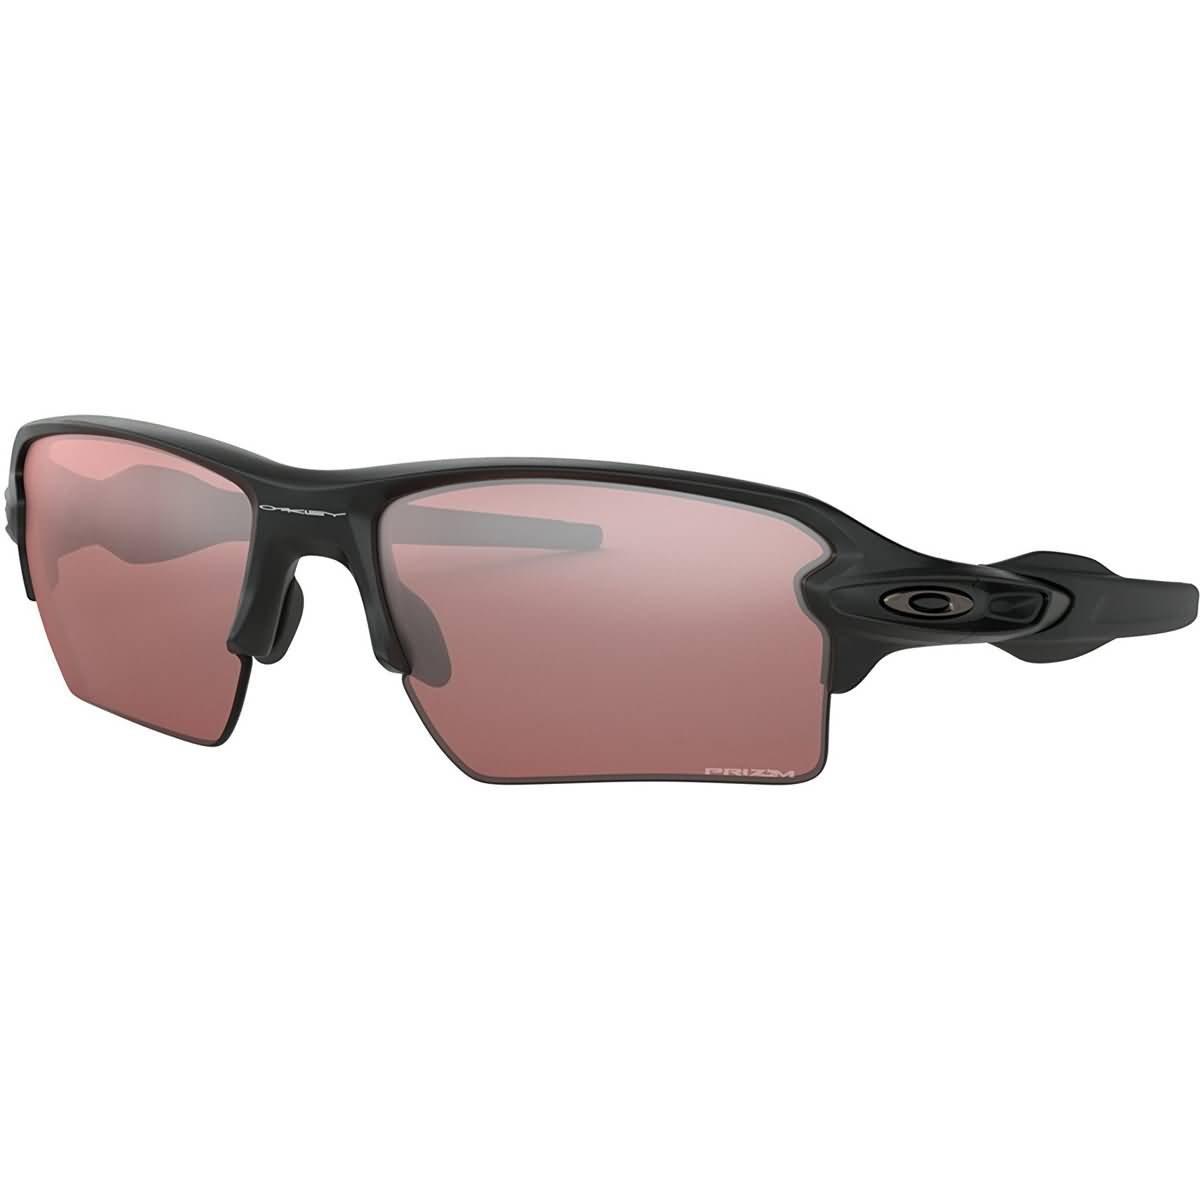 4623eb606783 Get Quotations · Oakley Flak 2.0 Xl Mtt Black W Prizm Dark Golf  (OO9188-9059)